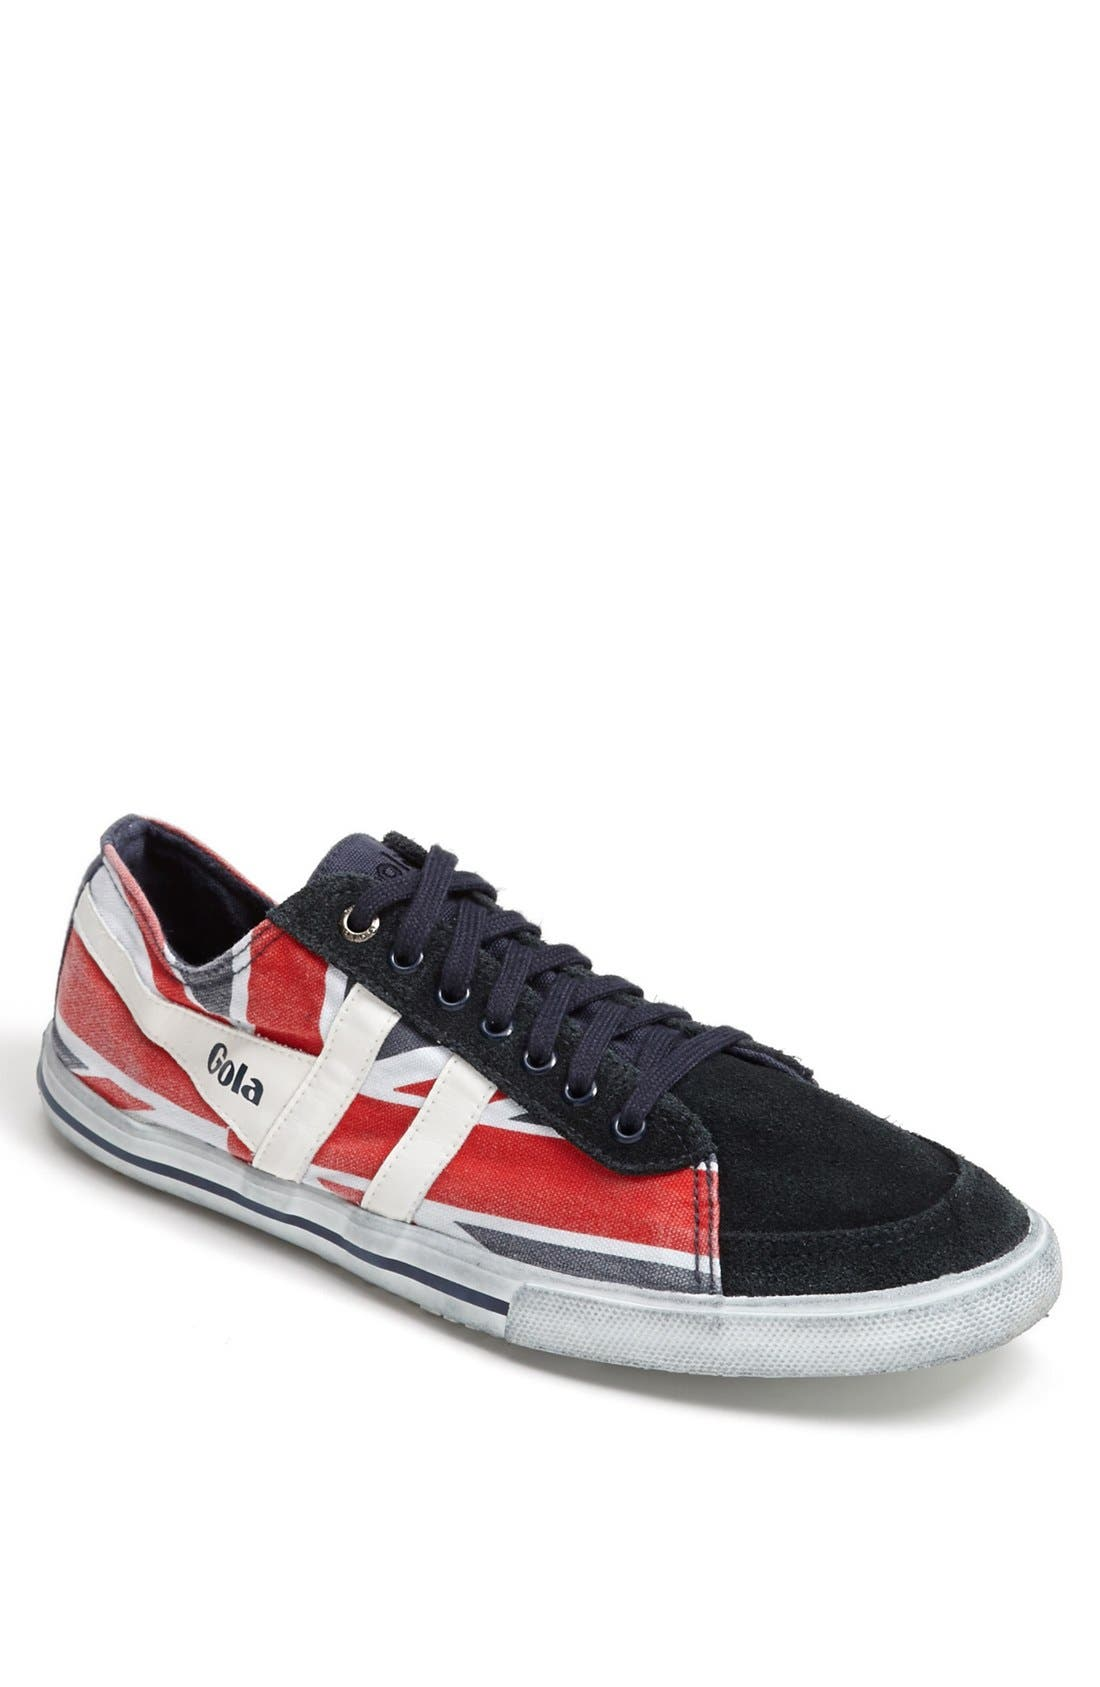 Main Image - Gola 'Quota - Union Jack' Sneaker (Men)